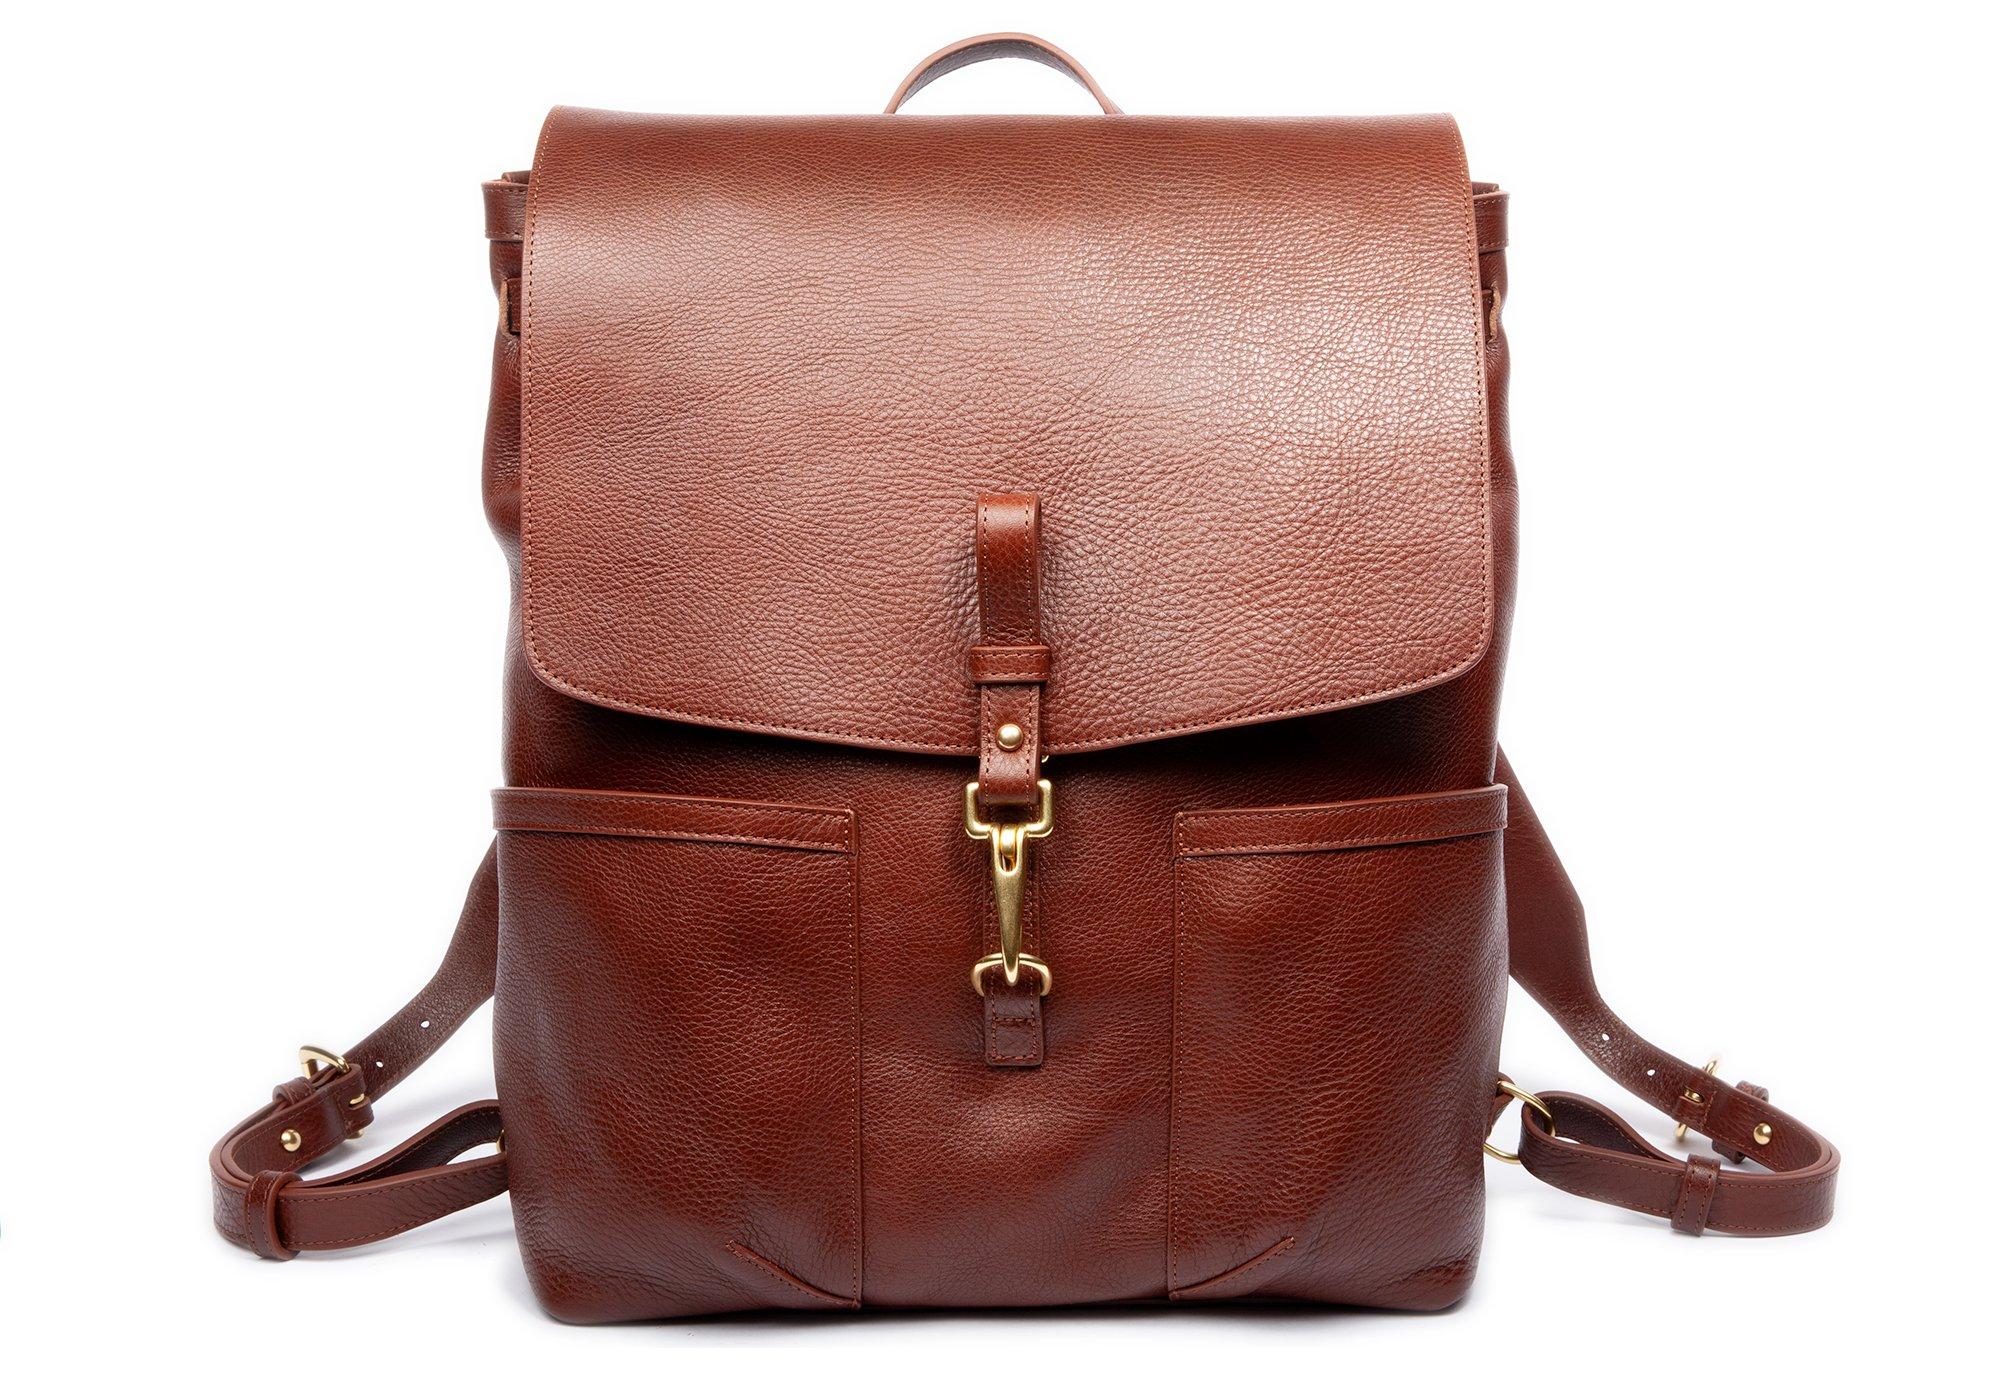 Lotuff-Leather-Knapsack_-Chestnut-1_2000x.progressive